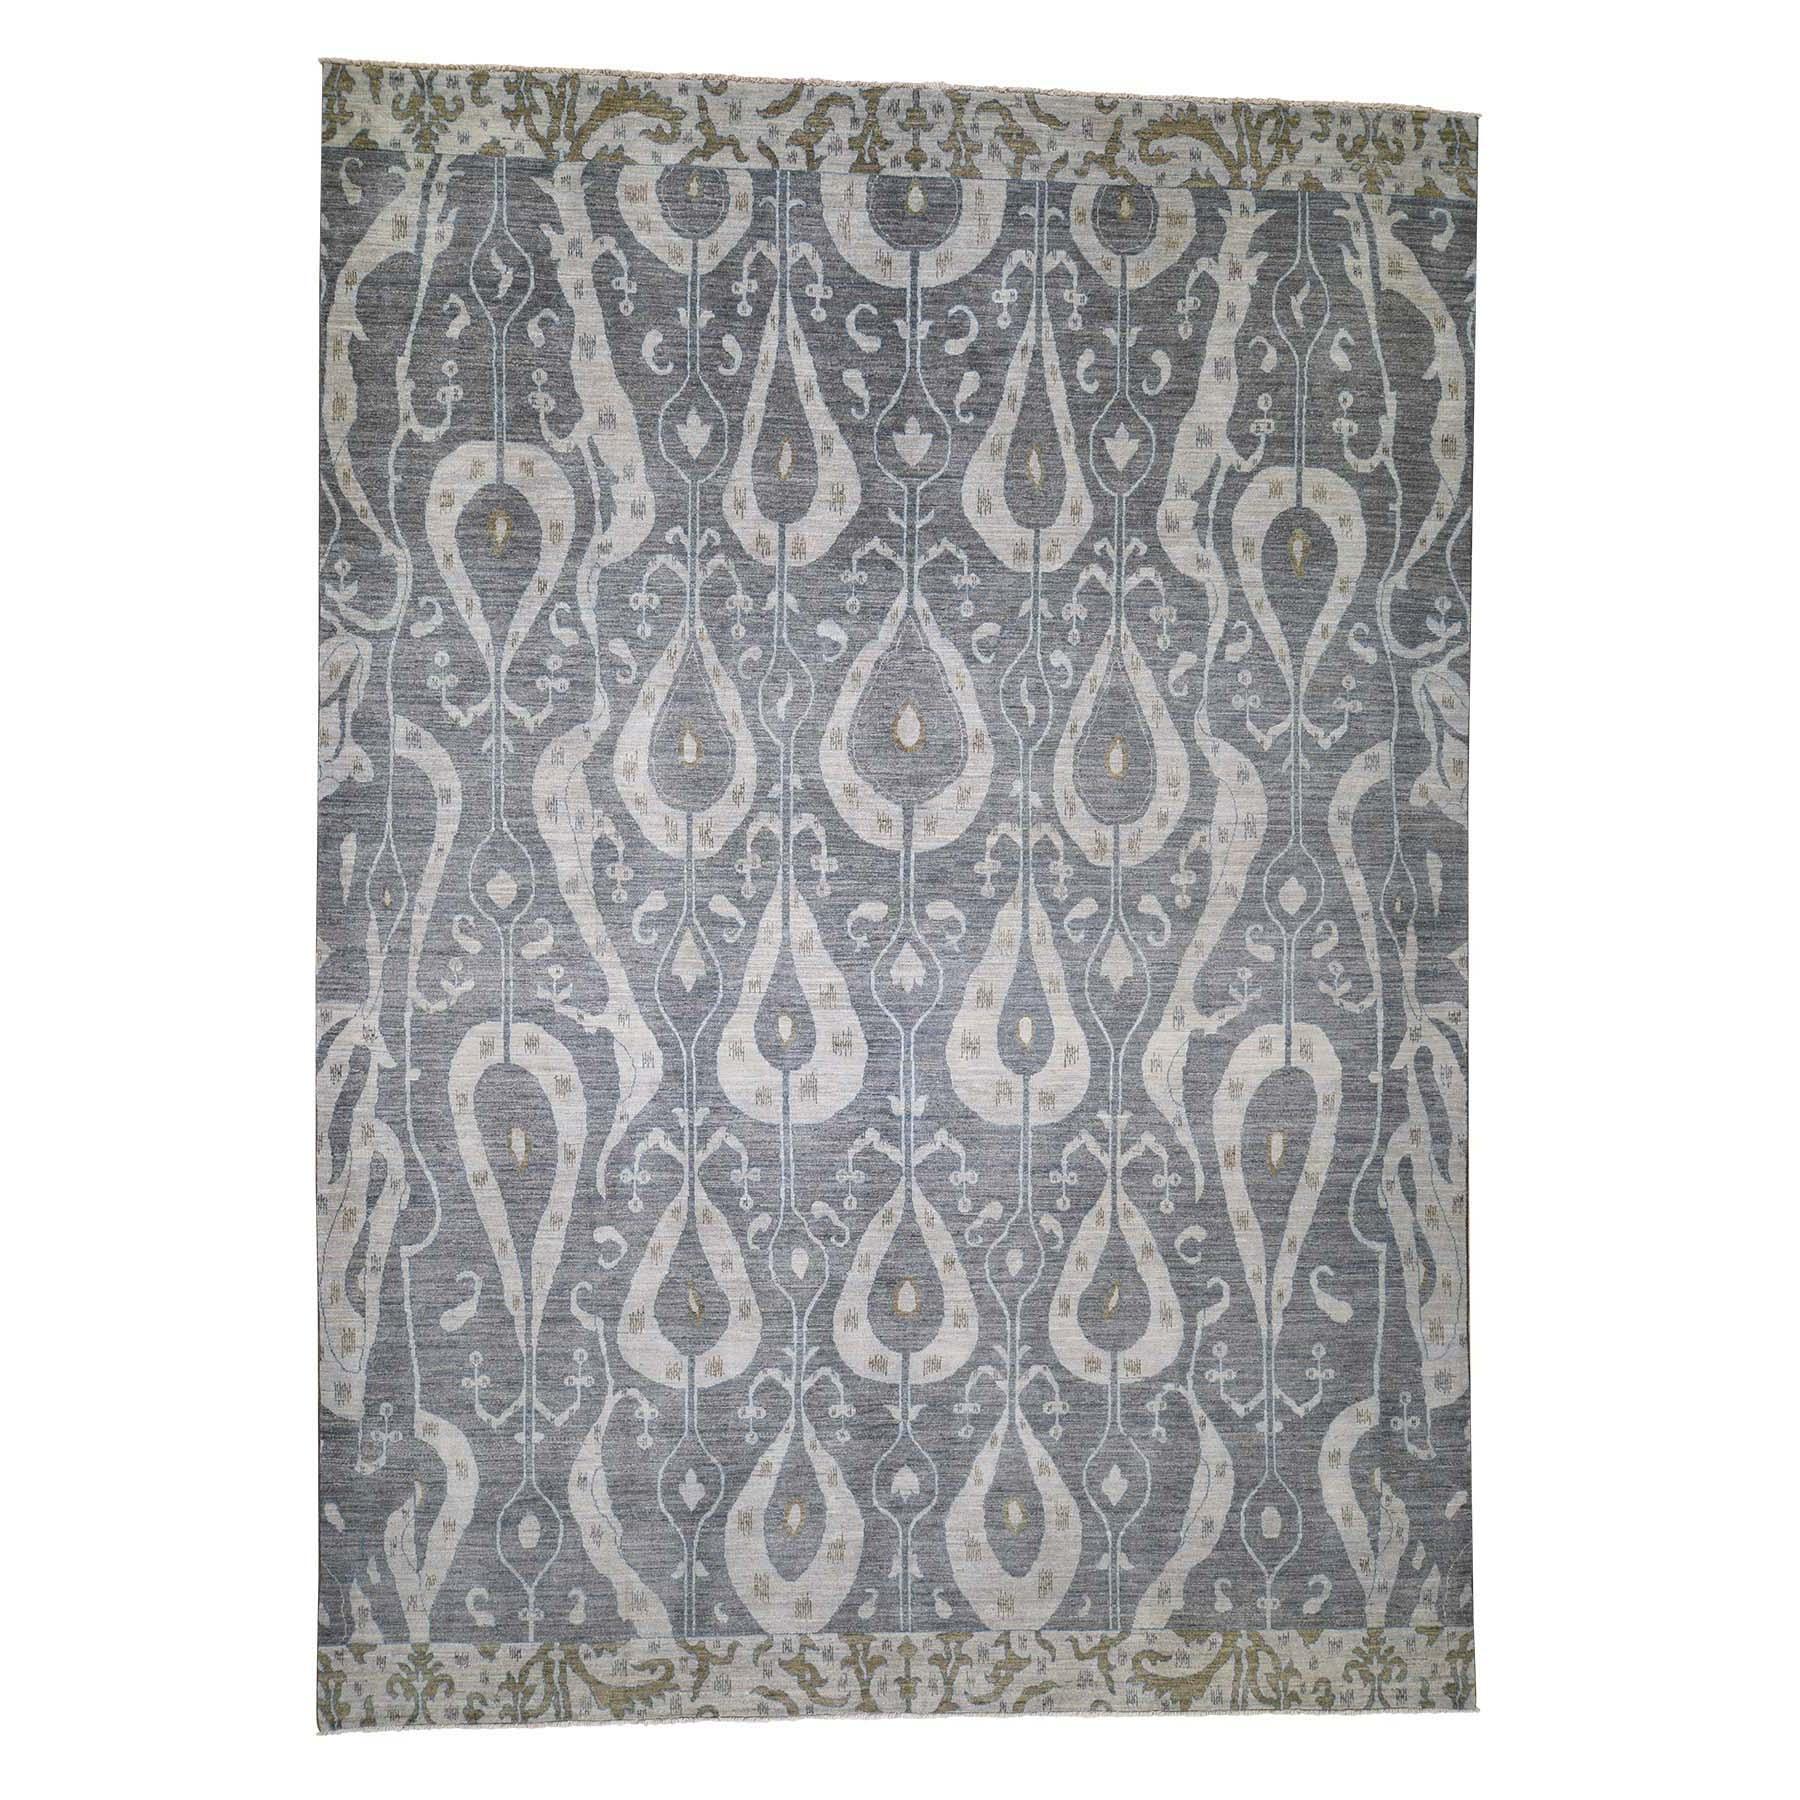 10'X14' Ikat Uzbek Design Pure Wool Hand Knotted Oriental Rug moadd786